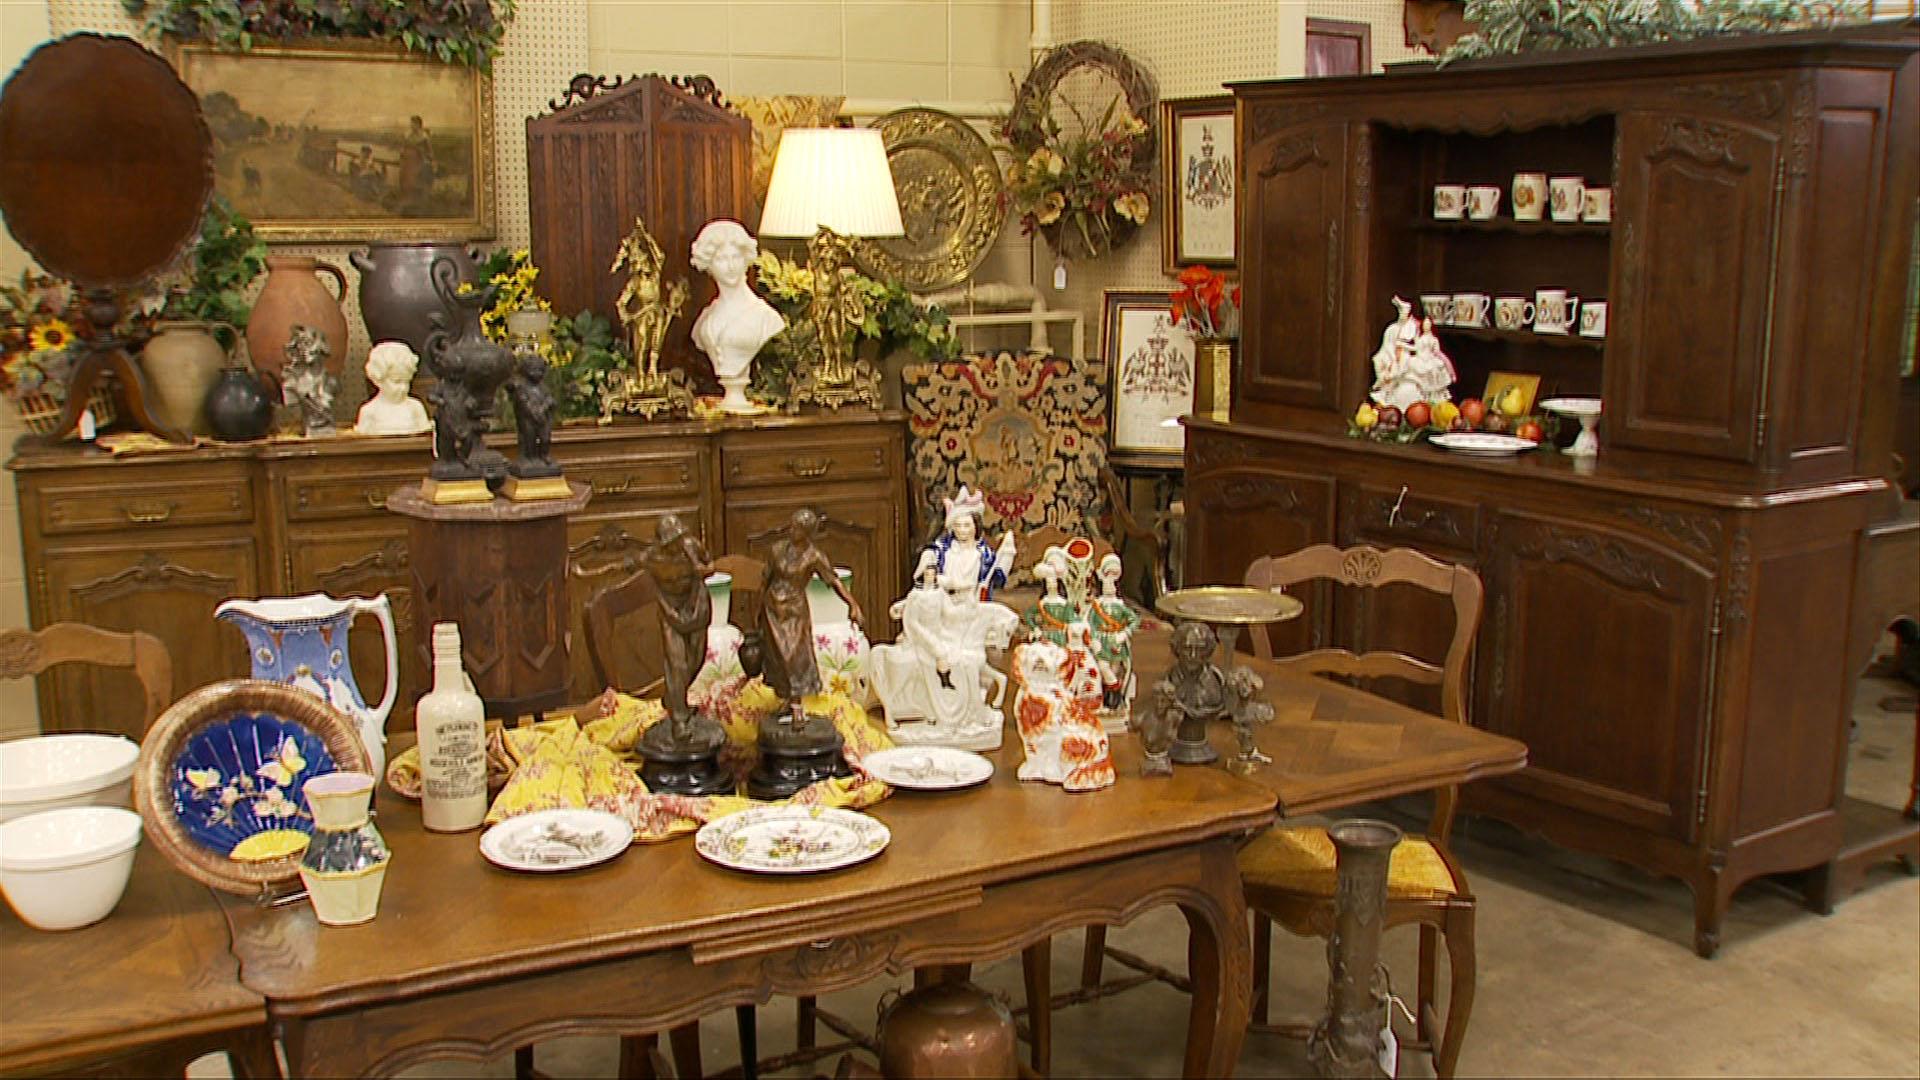 antique stores springfield mo Bélas heritage  Bélas heritage antique stores springfield mo